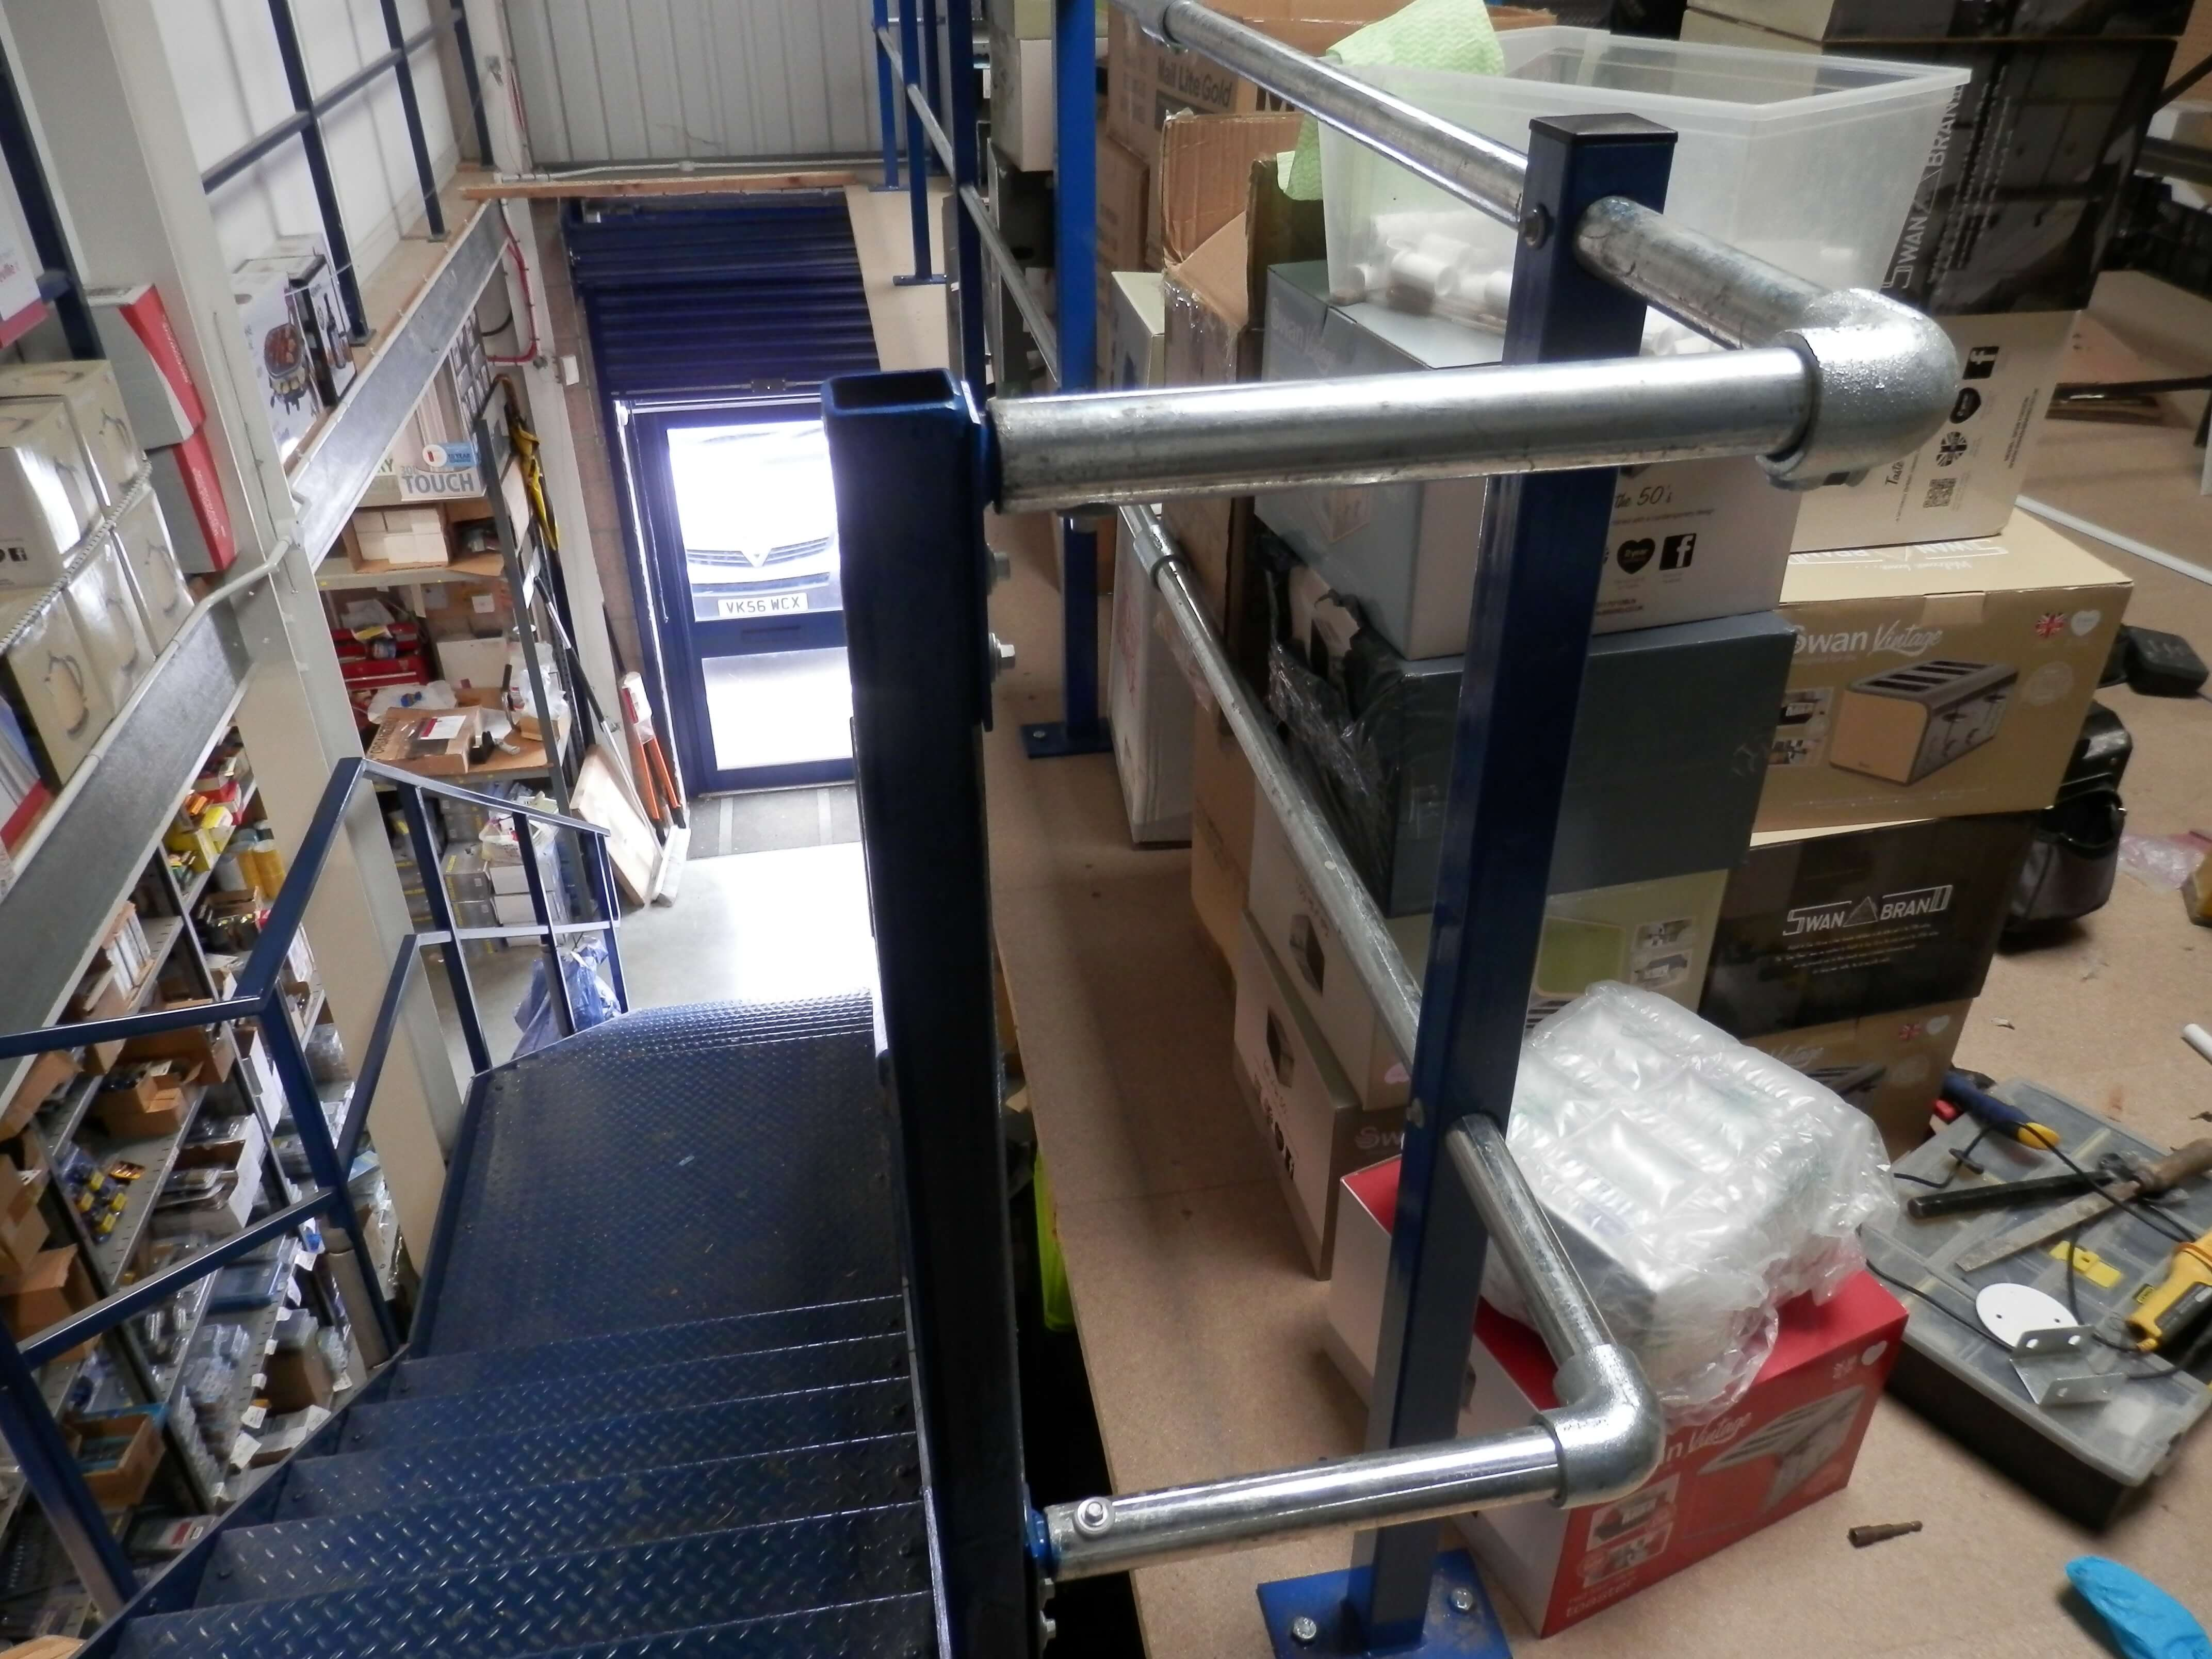 Handrail return